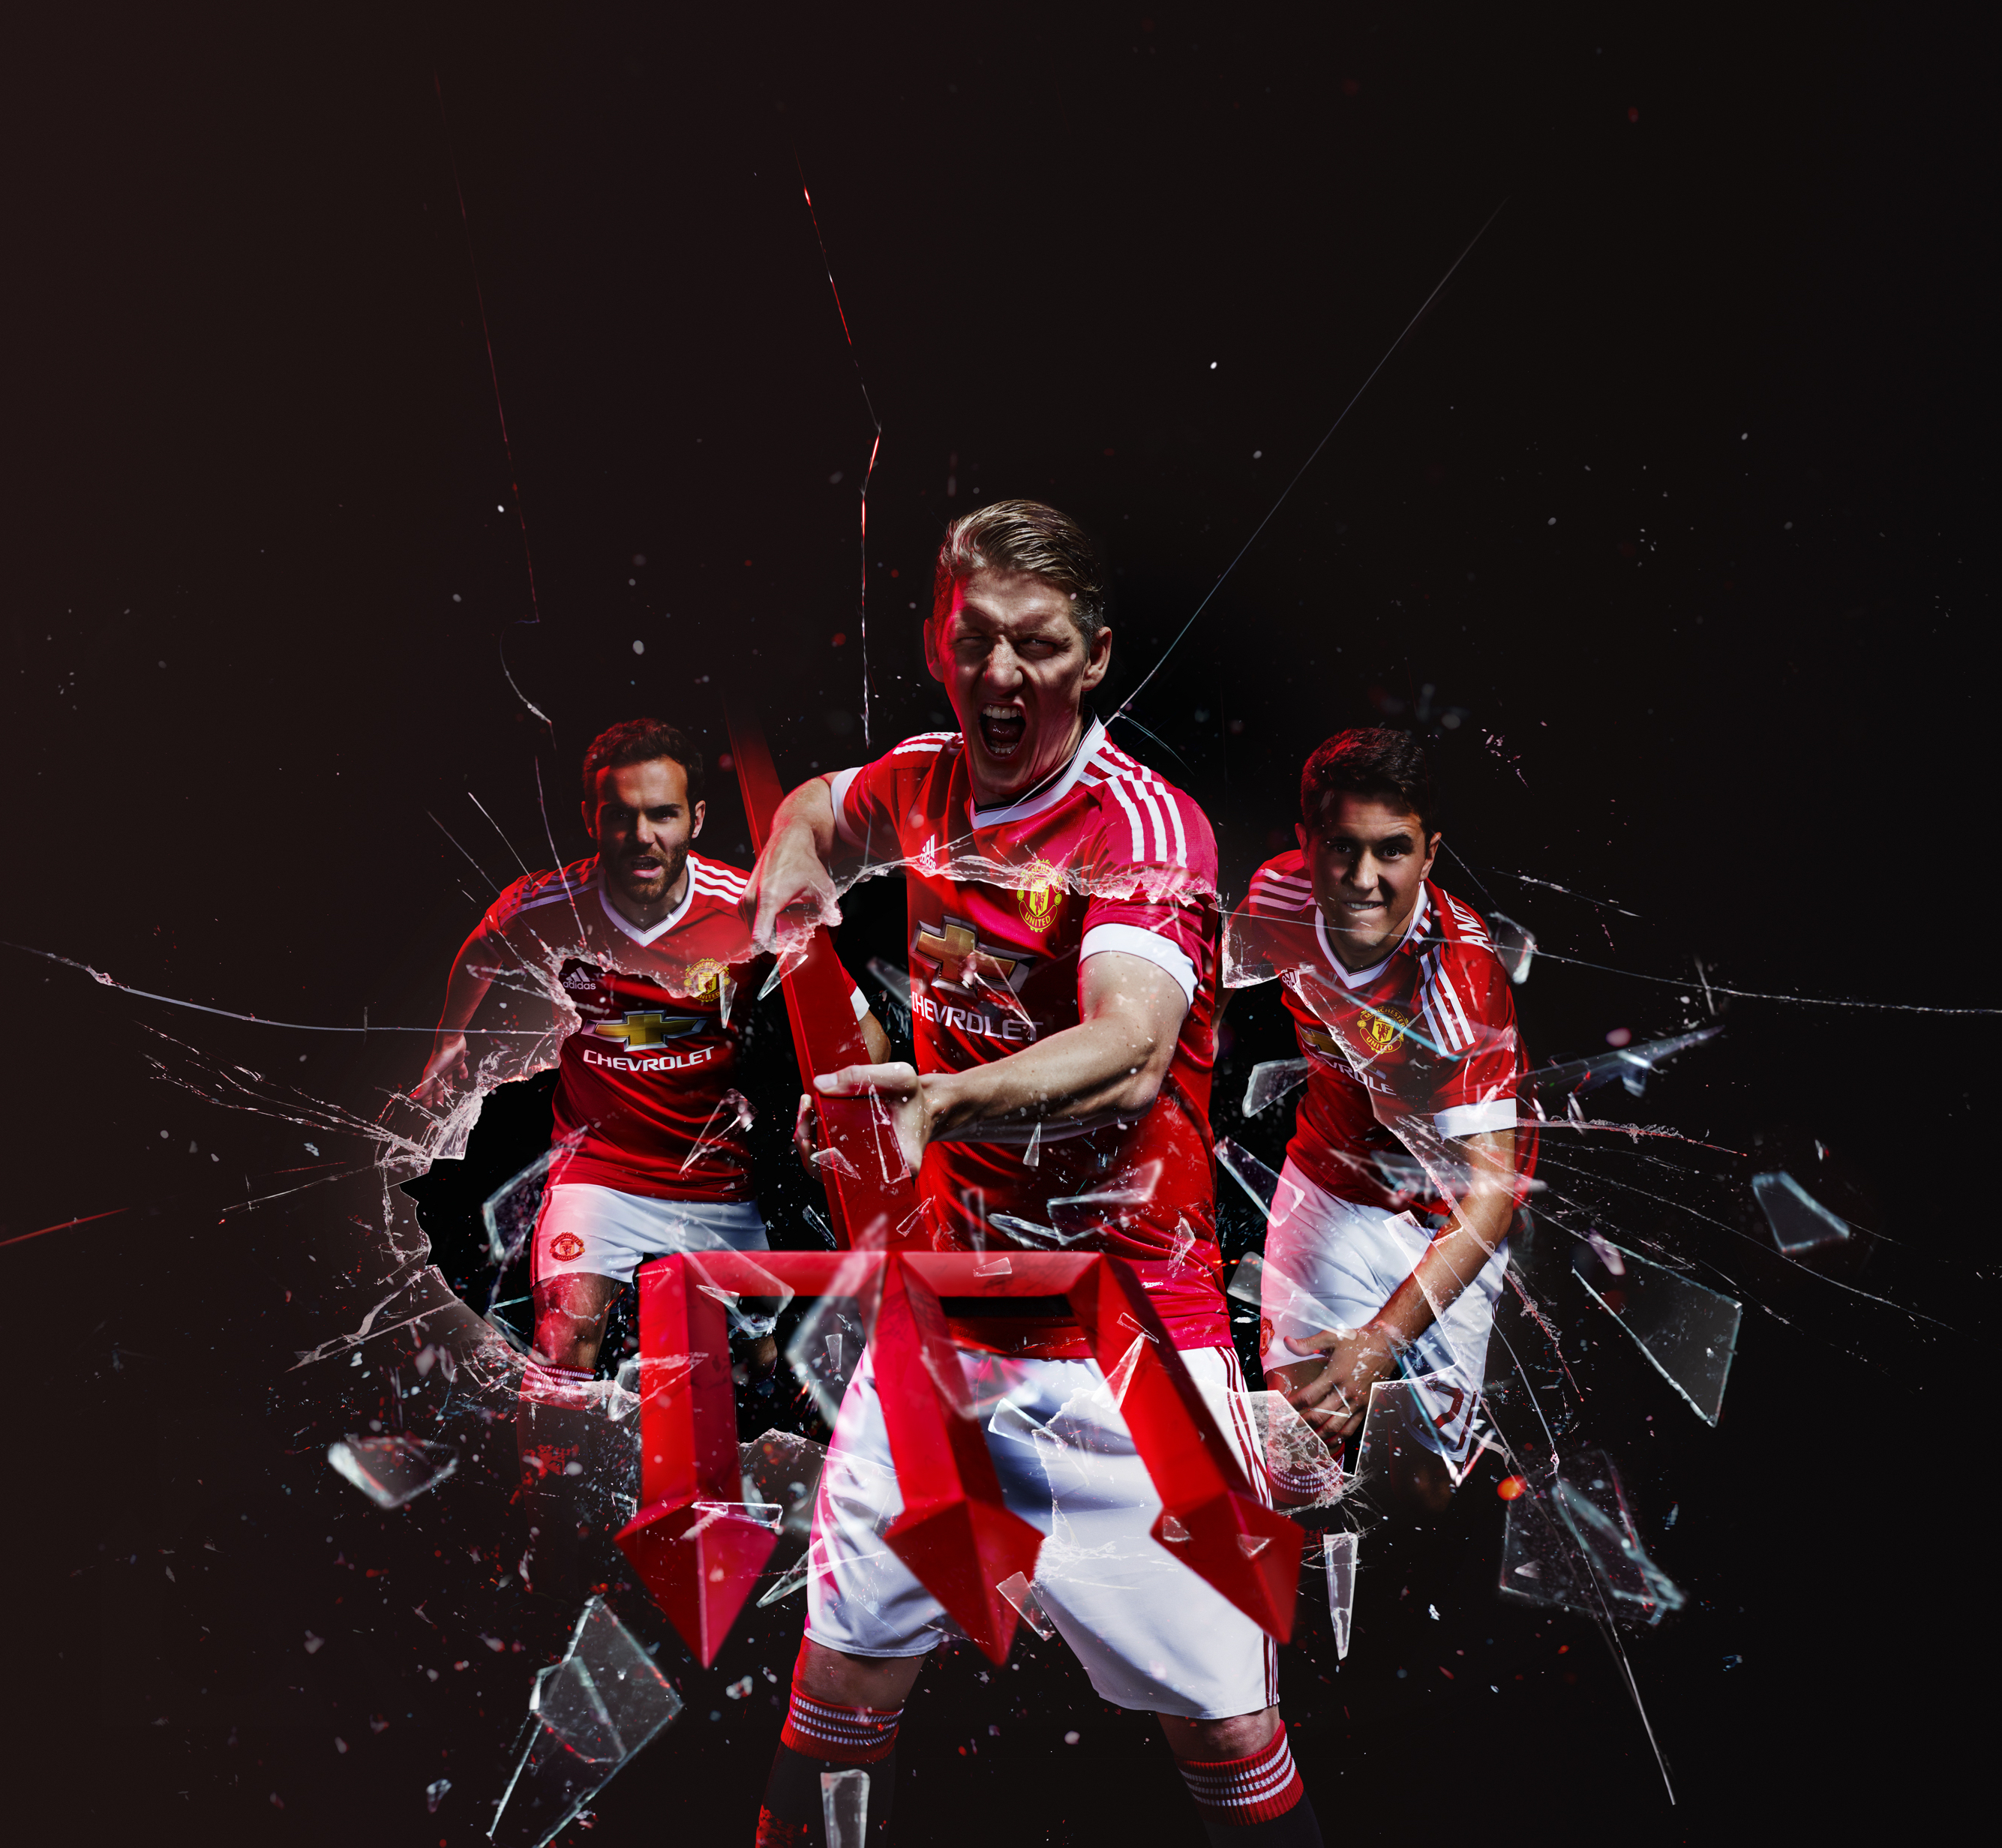 Adidas Manchester United 15-16 kits